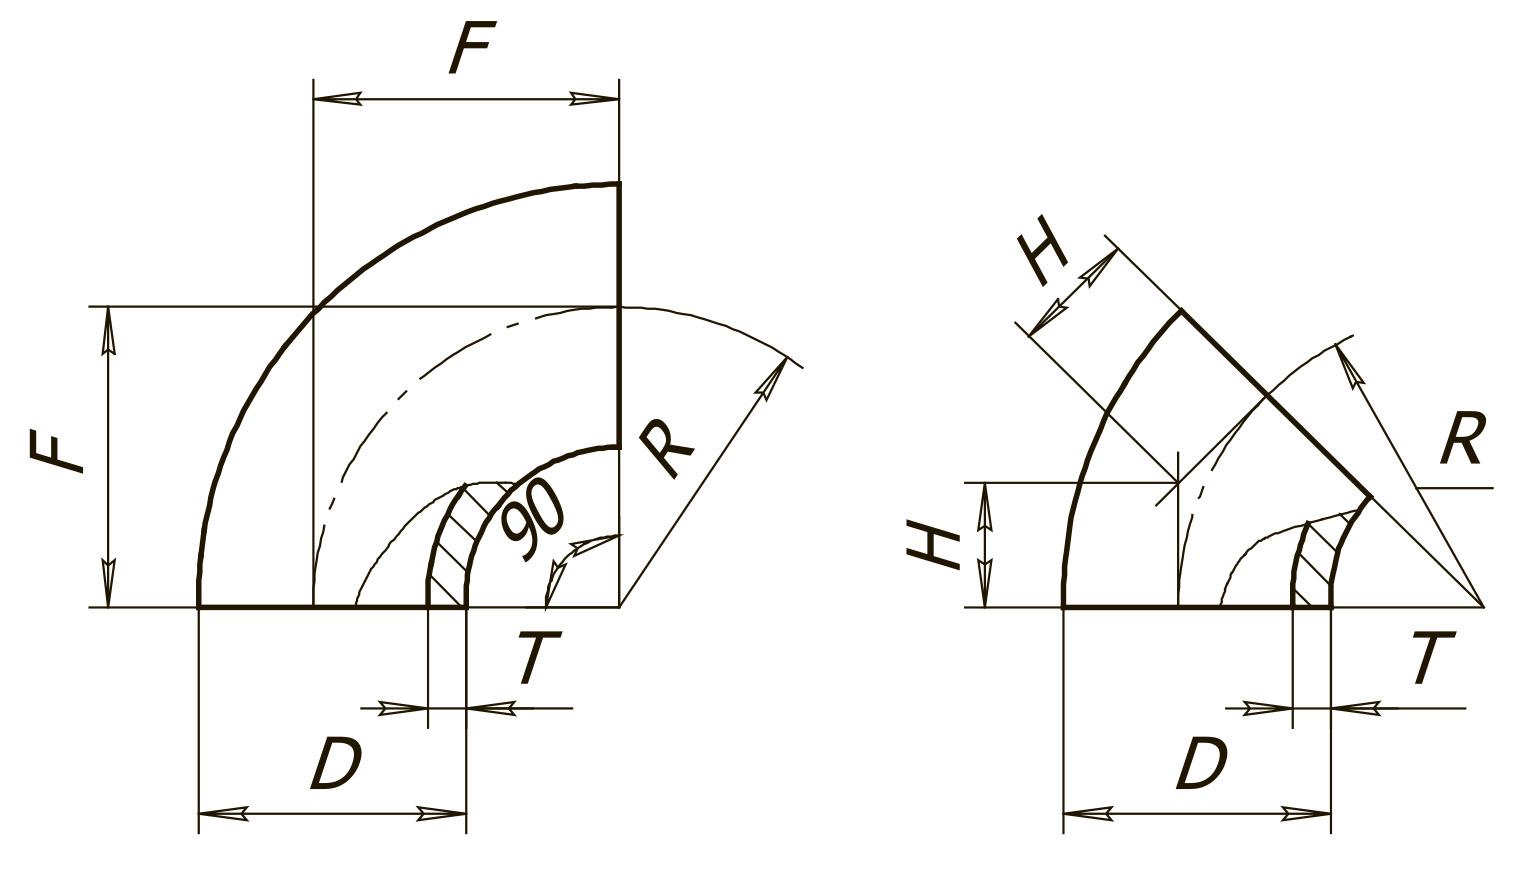 Отводы крутоизогнутые ТИП 3D ТУ 1468-009-01394395-03